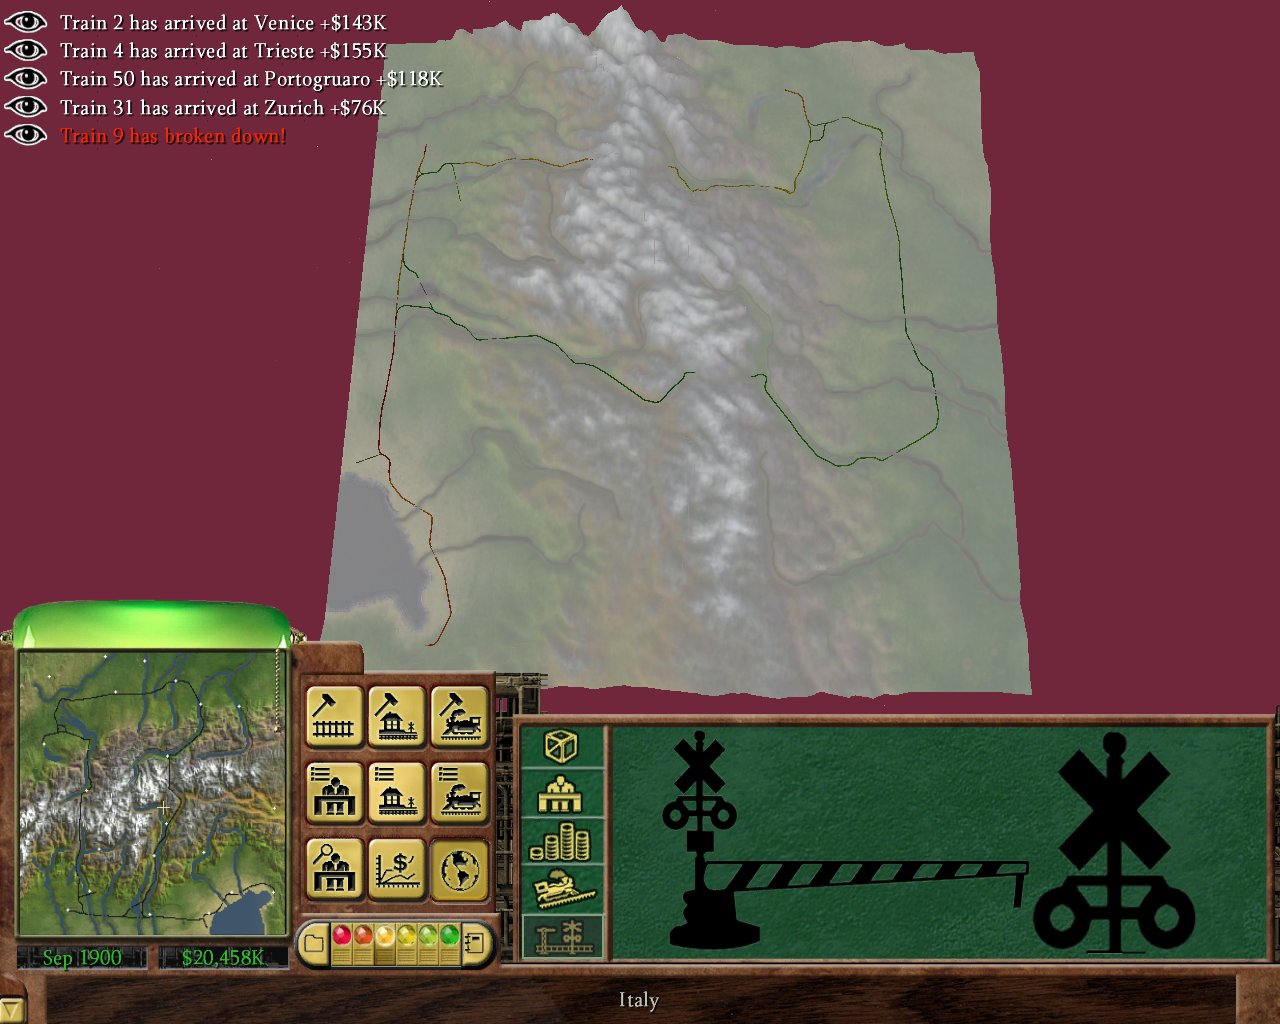 Acido's Website - RailRoad Tycoon 3 Screenshots